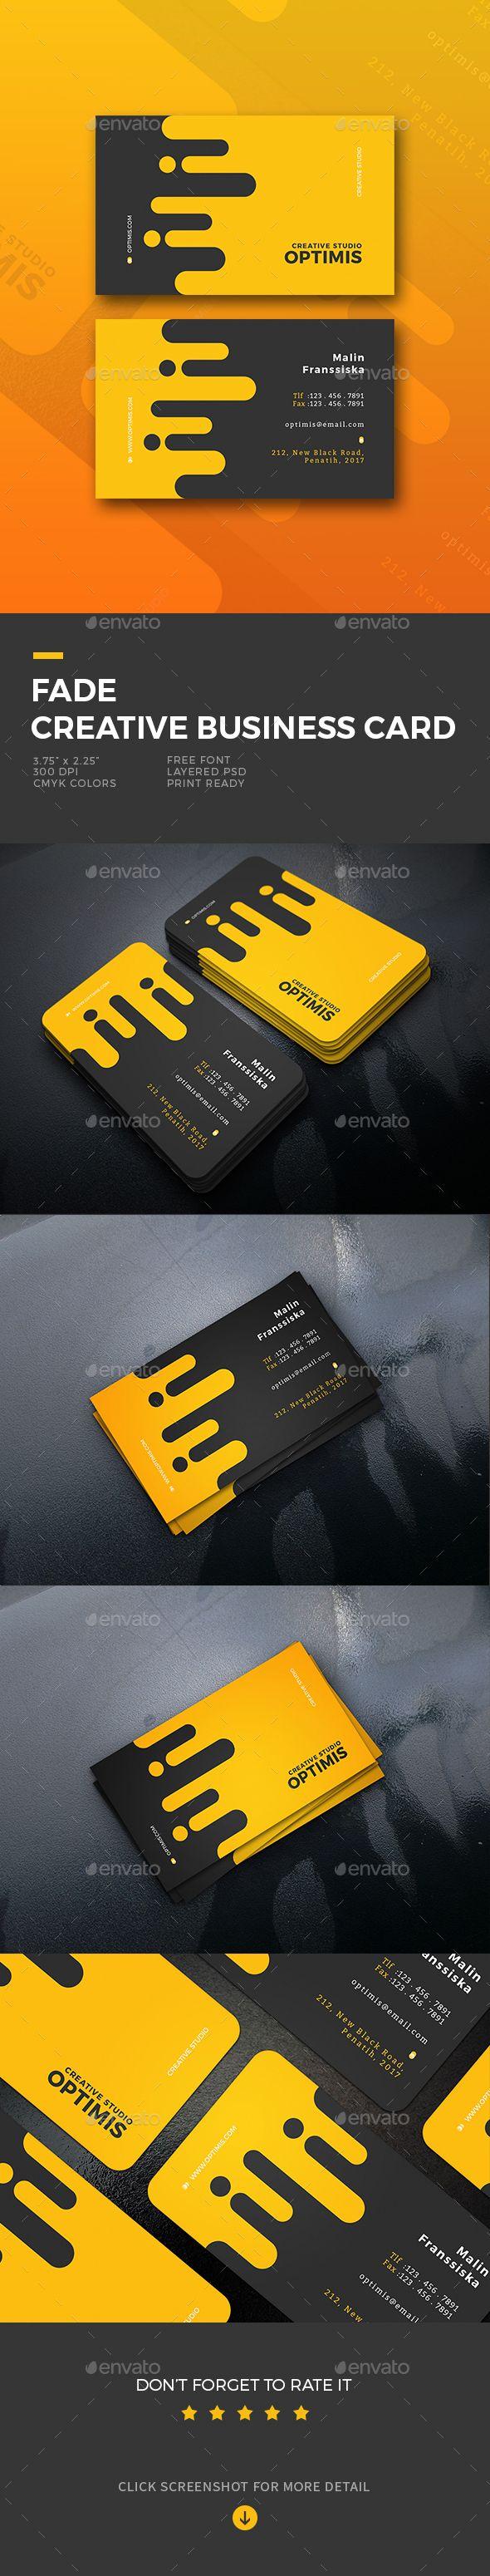 Fade Creative Business Card Template PSD Graphiques Carte De Visite Design